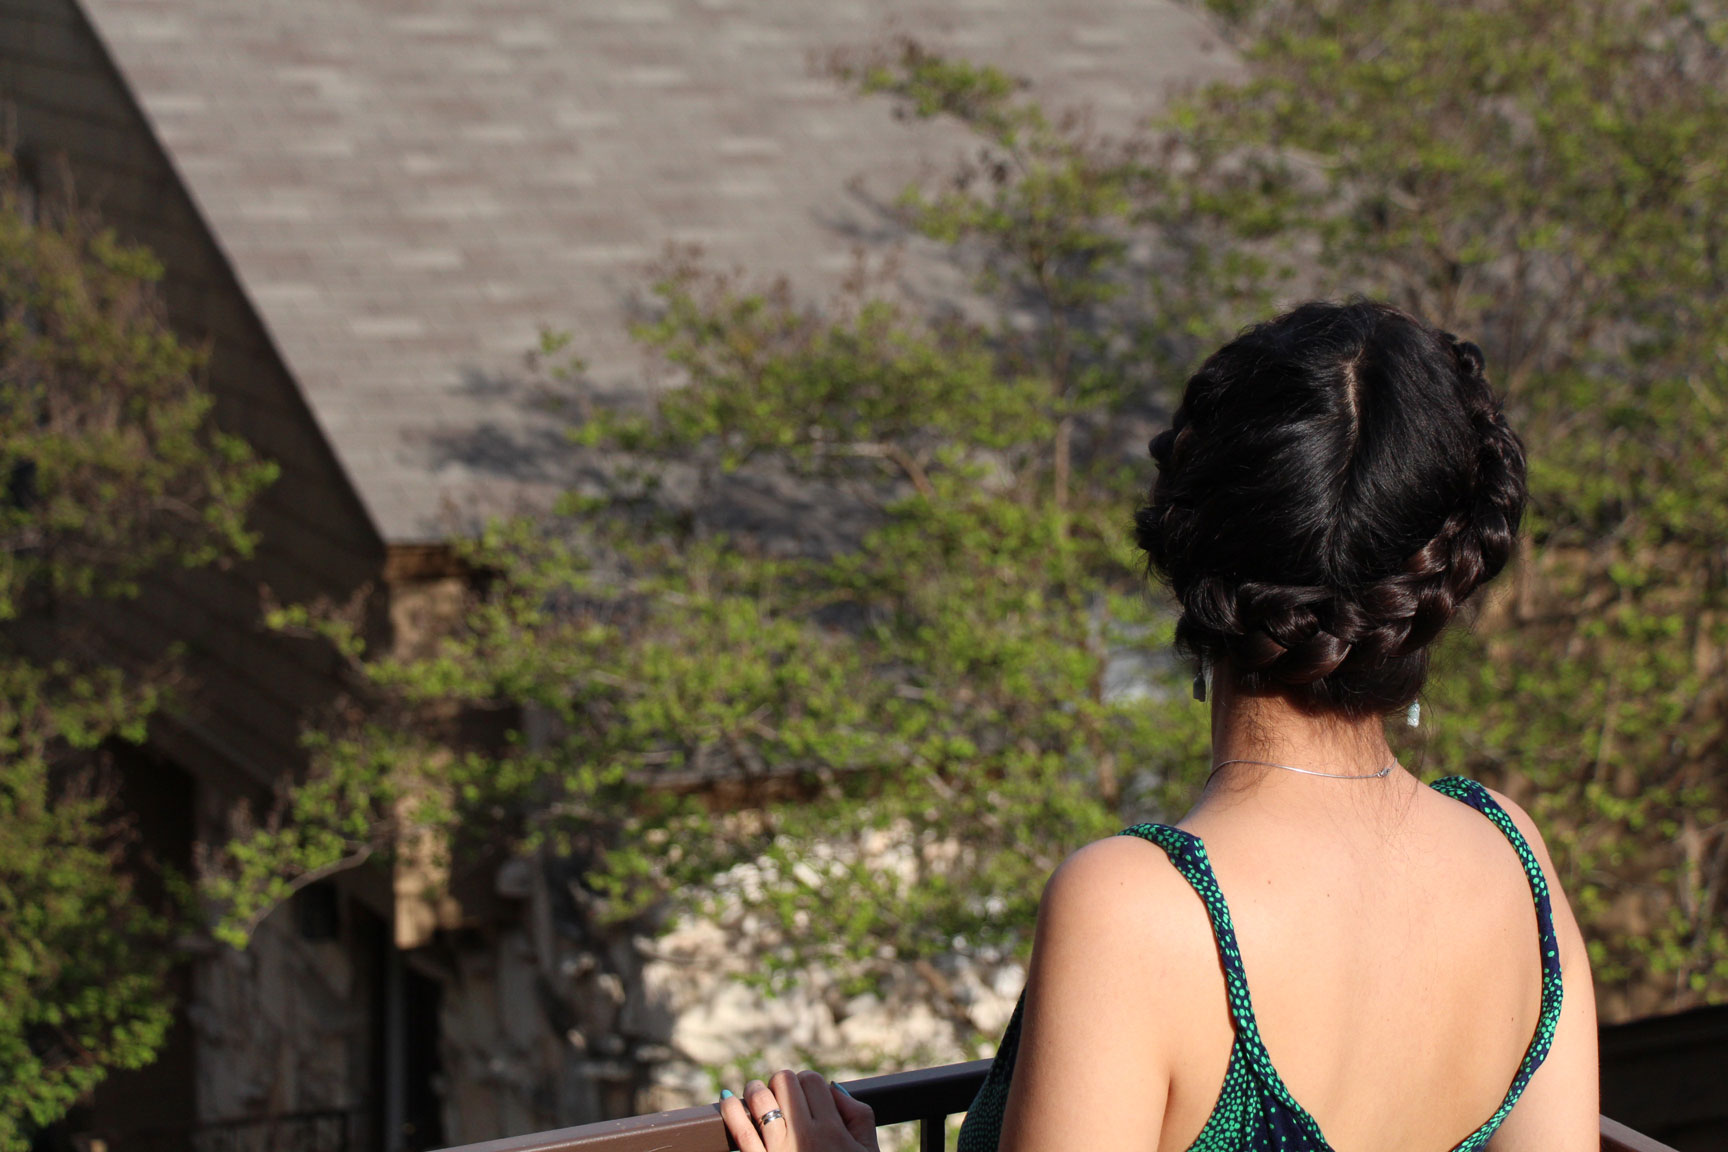 Aureolas Gigantes halo braid - trenza aureola - avanti morocha